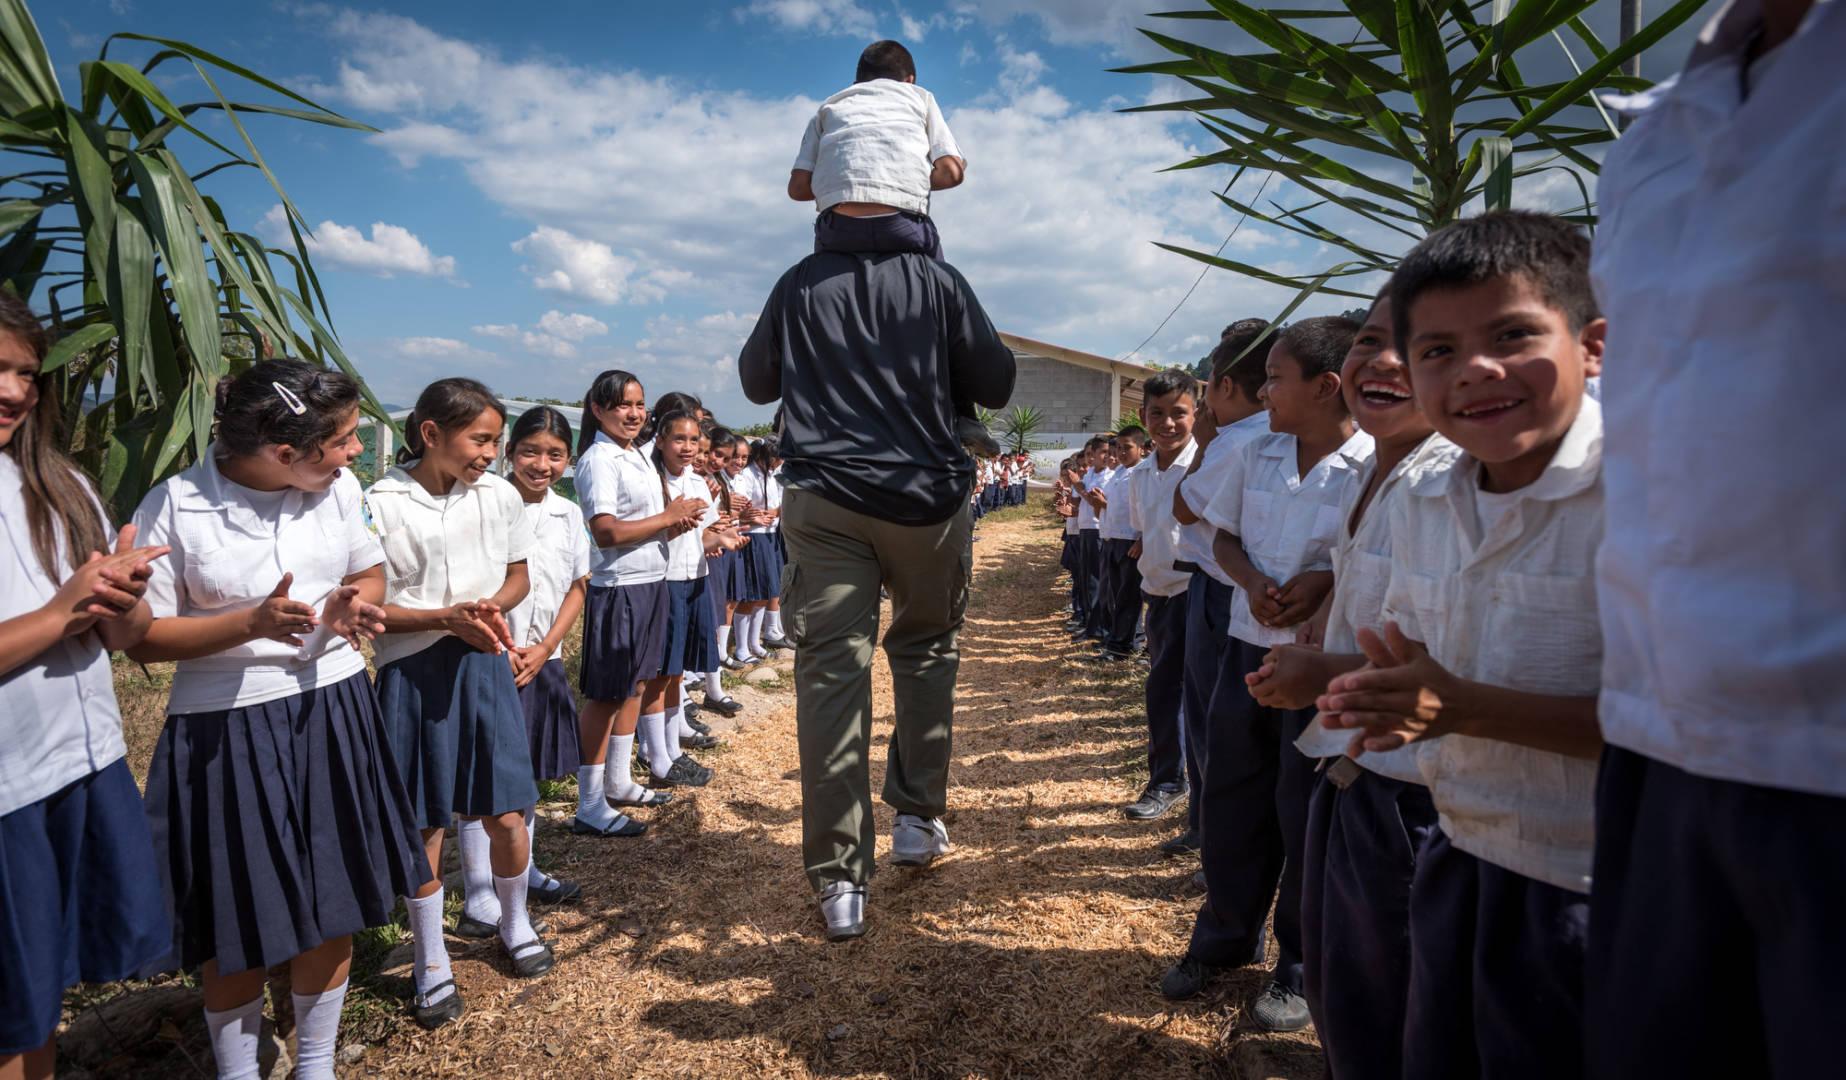 One of our favorite photos of 2016 is of the NFL's Kelvin Beachum, Jr., in Honduras.